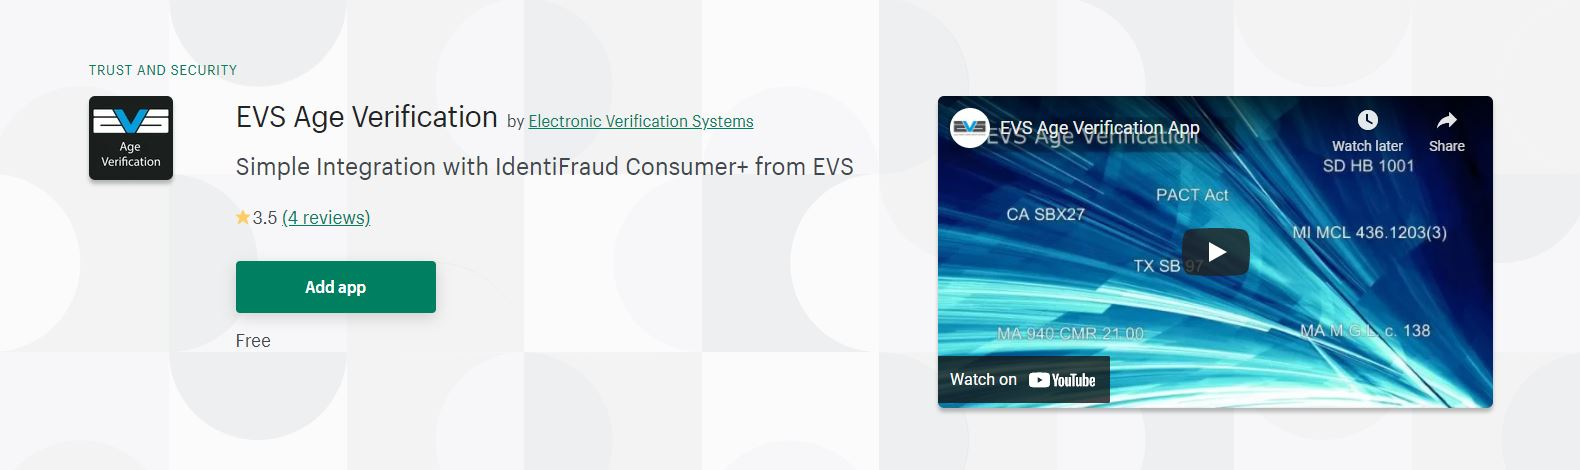 Shopify age verification app